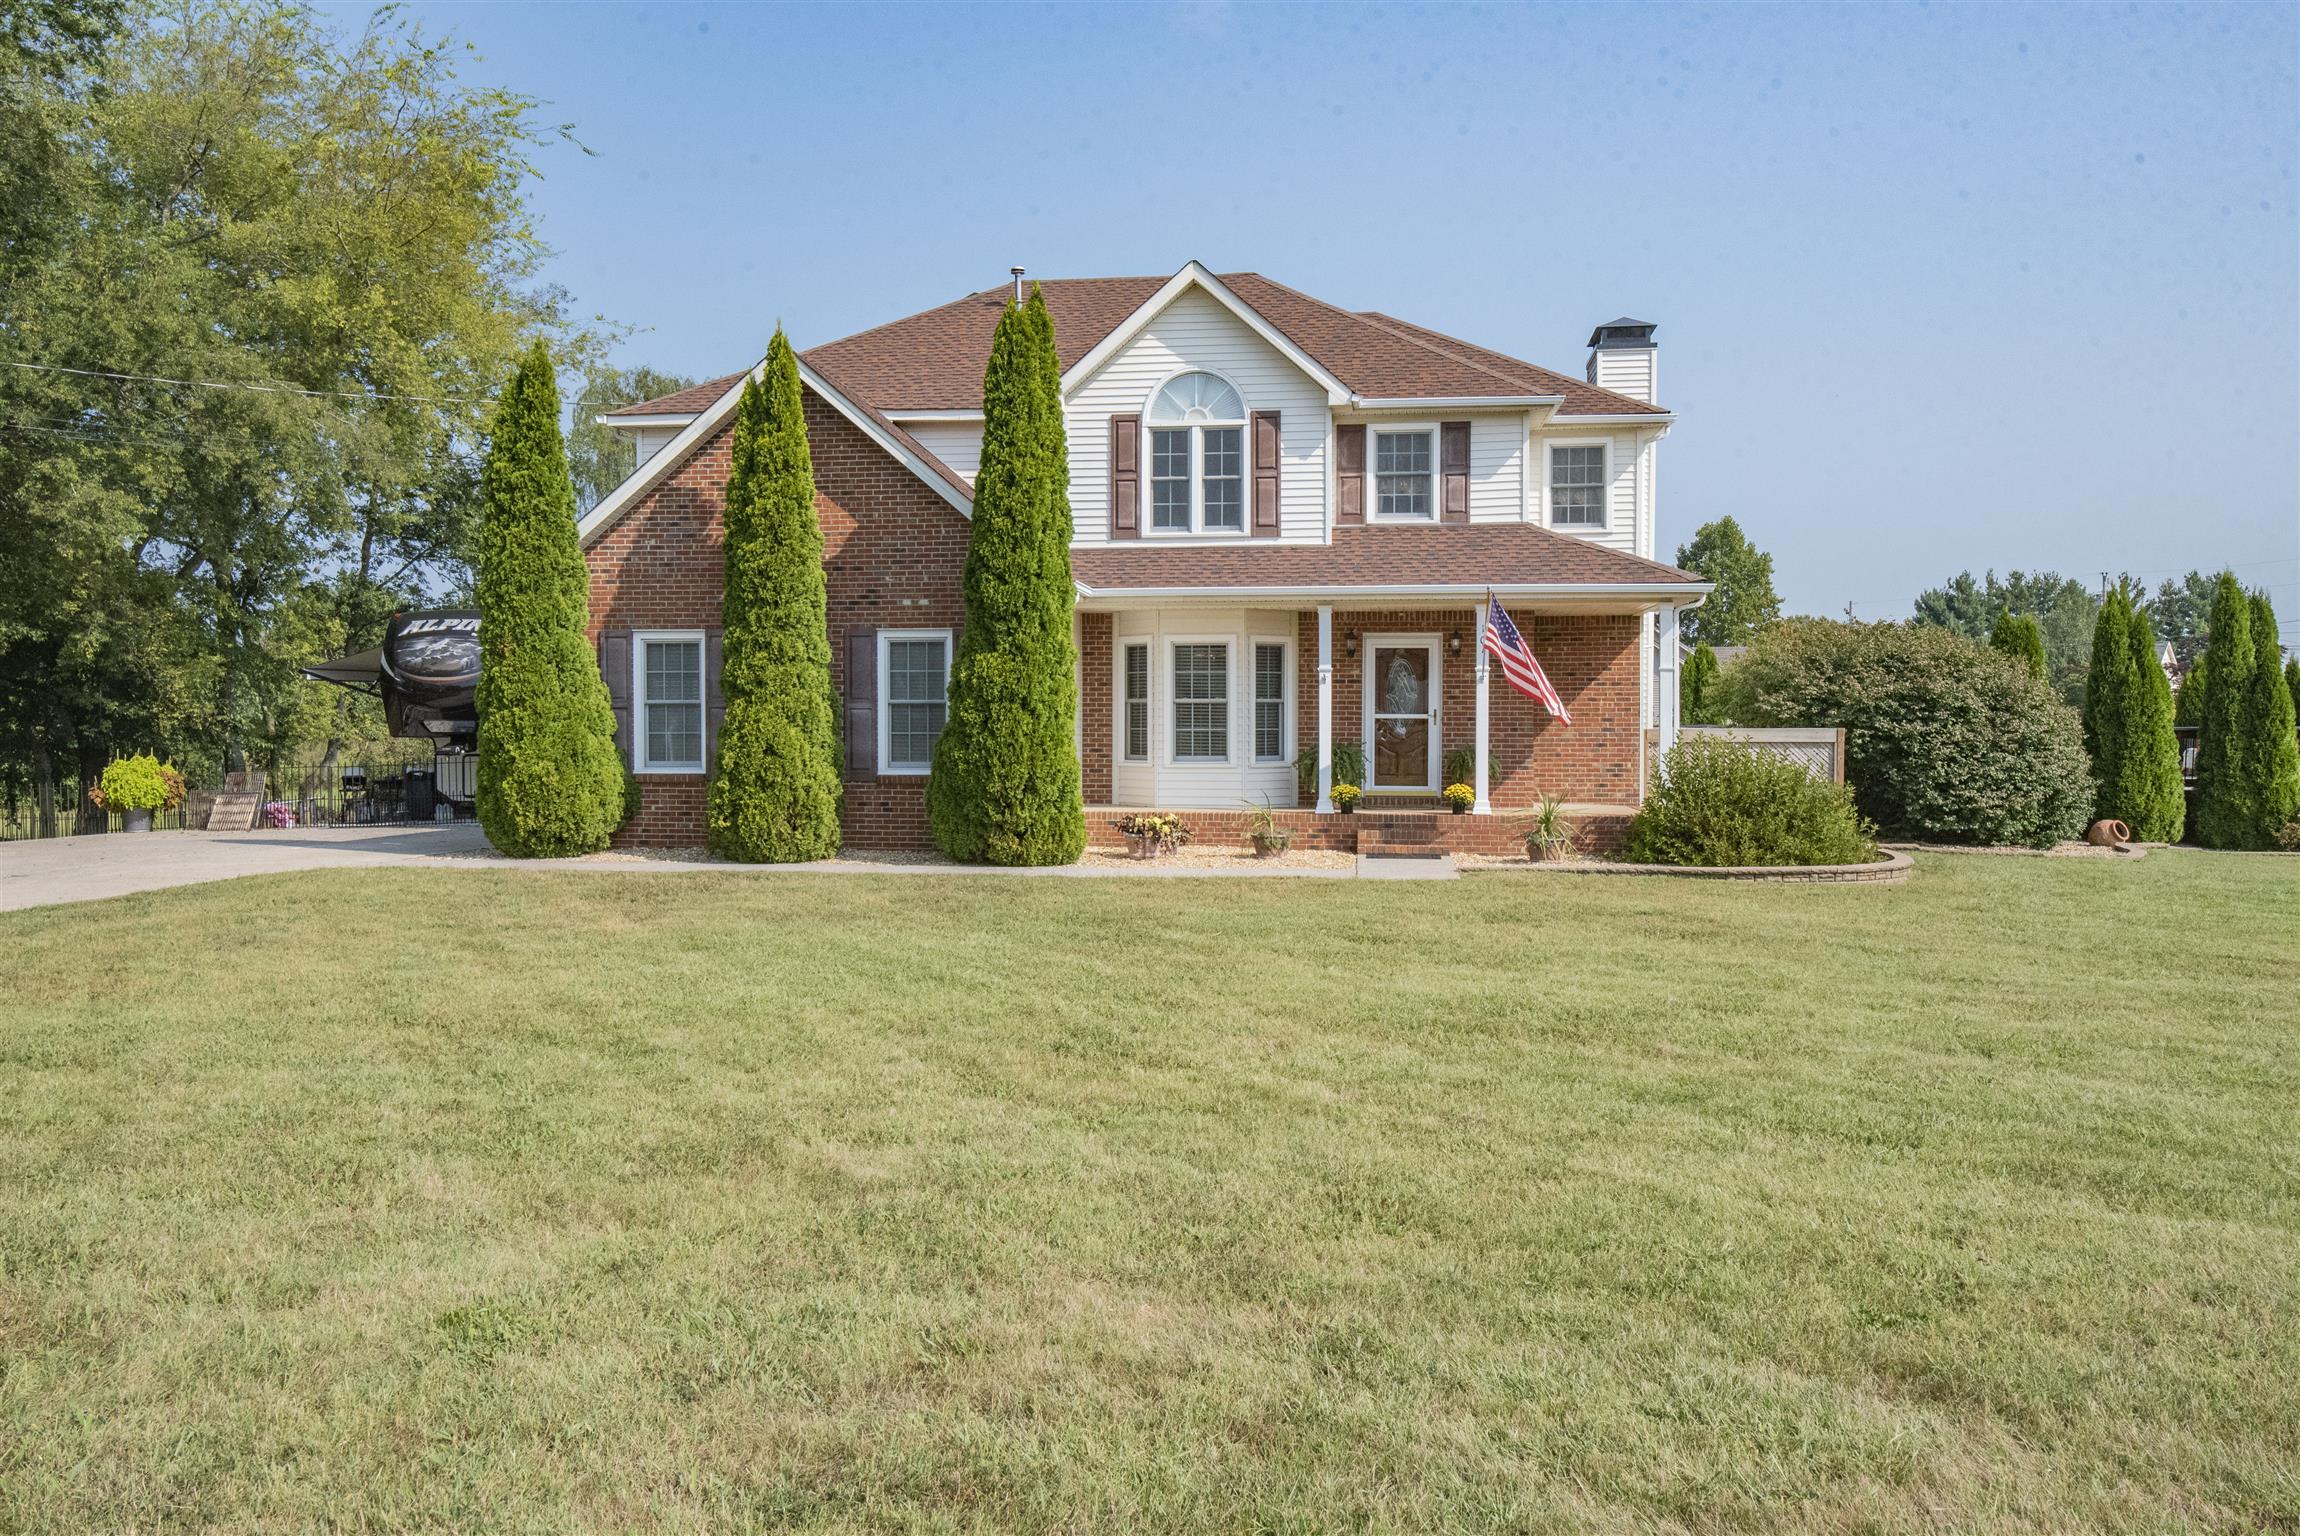 104 Kingston Ct, Murfreesboro, TN 37127 - Murfreesboro, TN real estate listing